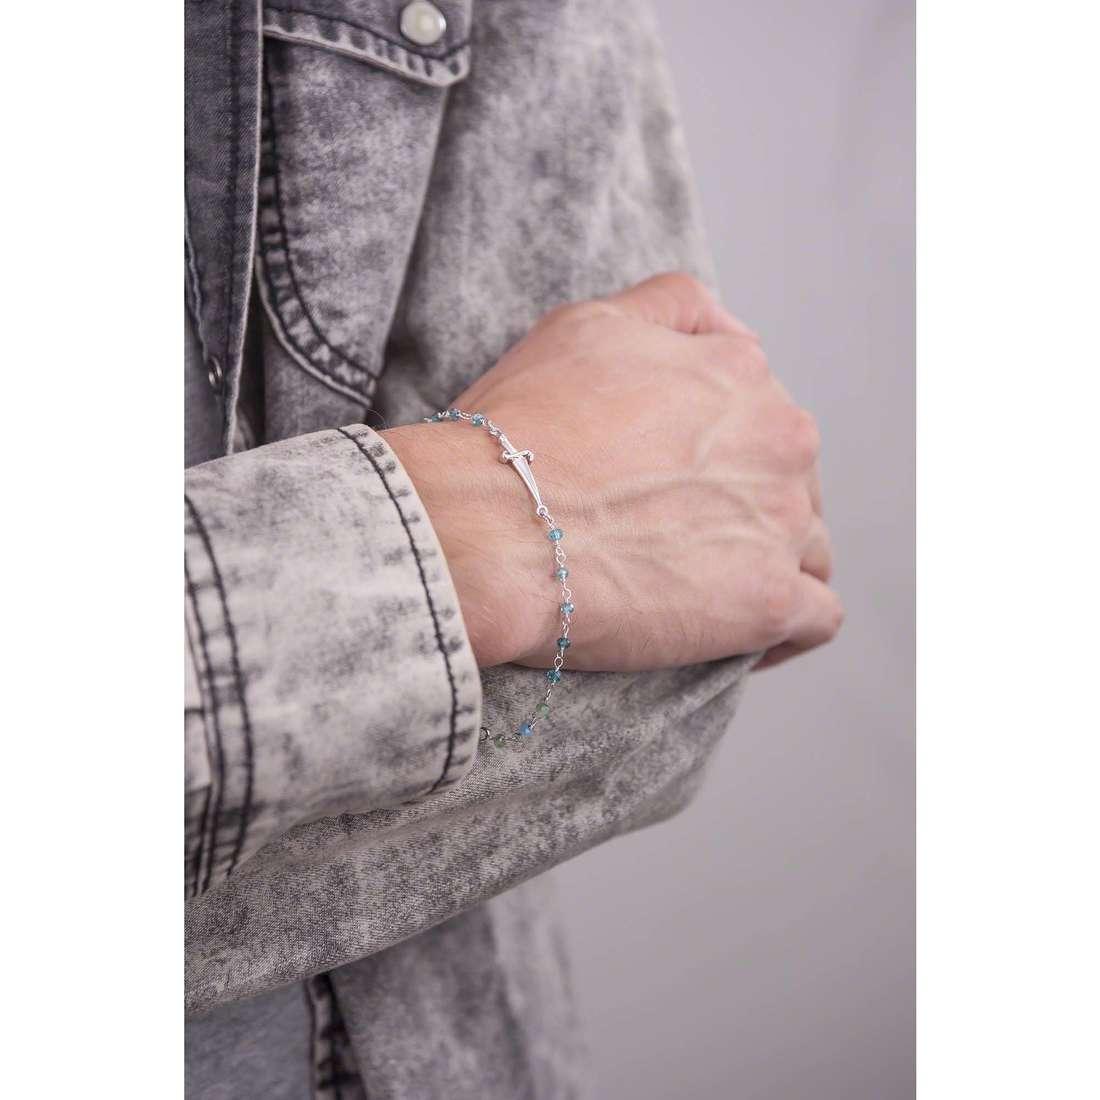 Cesare Paciotti bracciali uomo JPBR1206B indosso